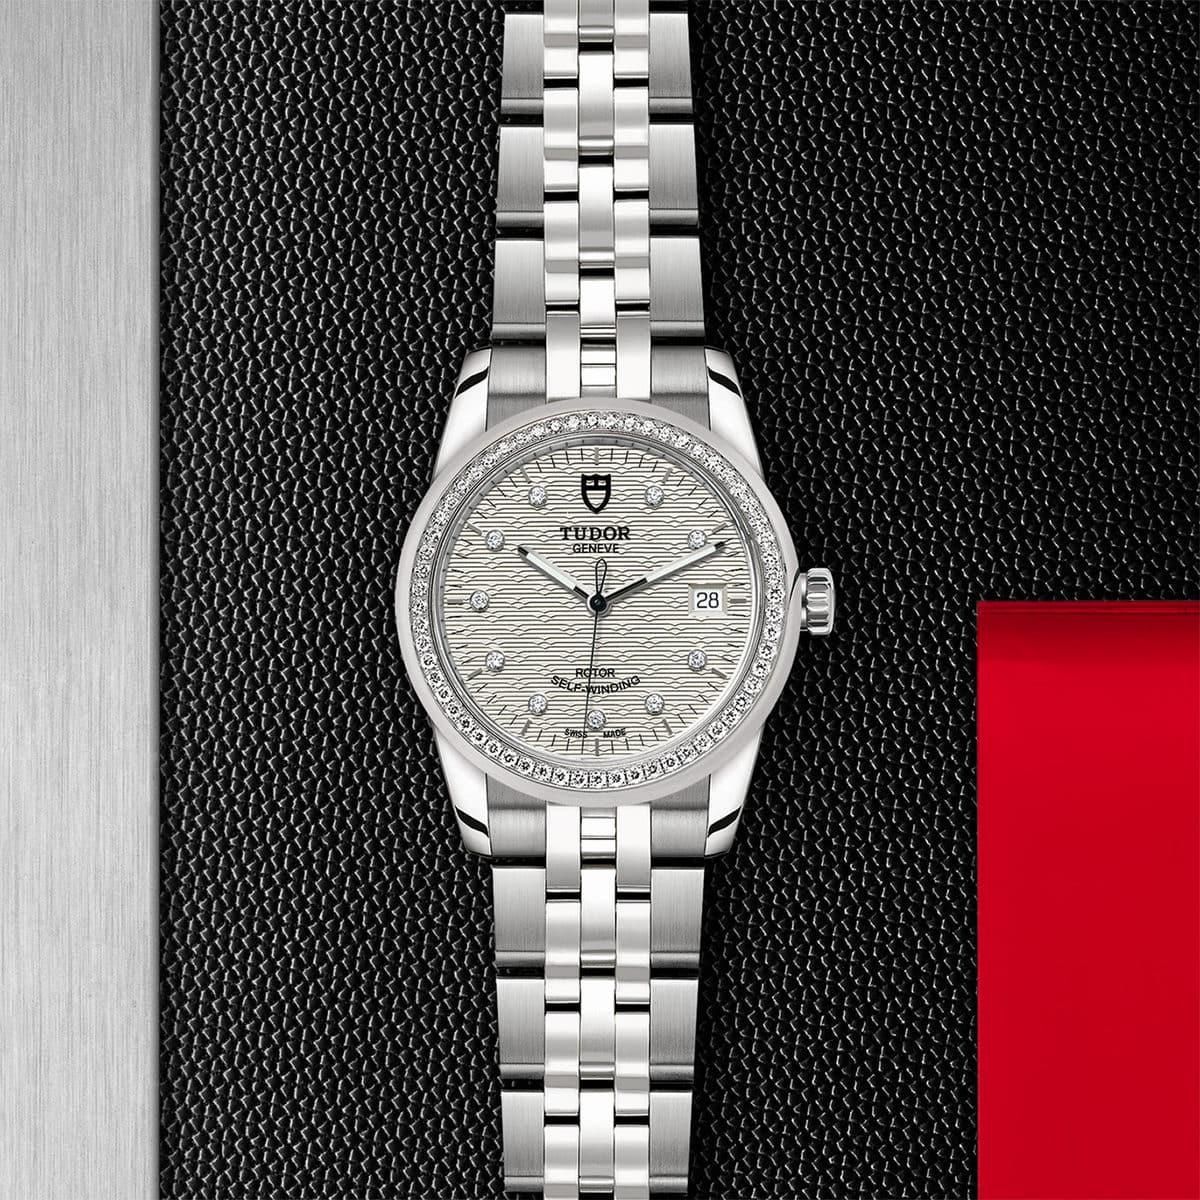 Tudor Glamour Date M55020-0001